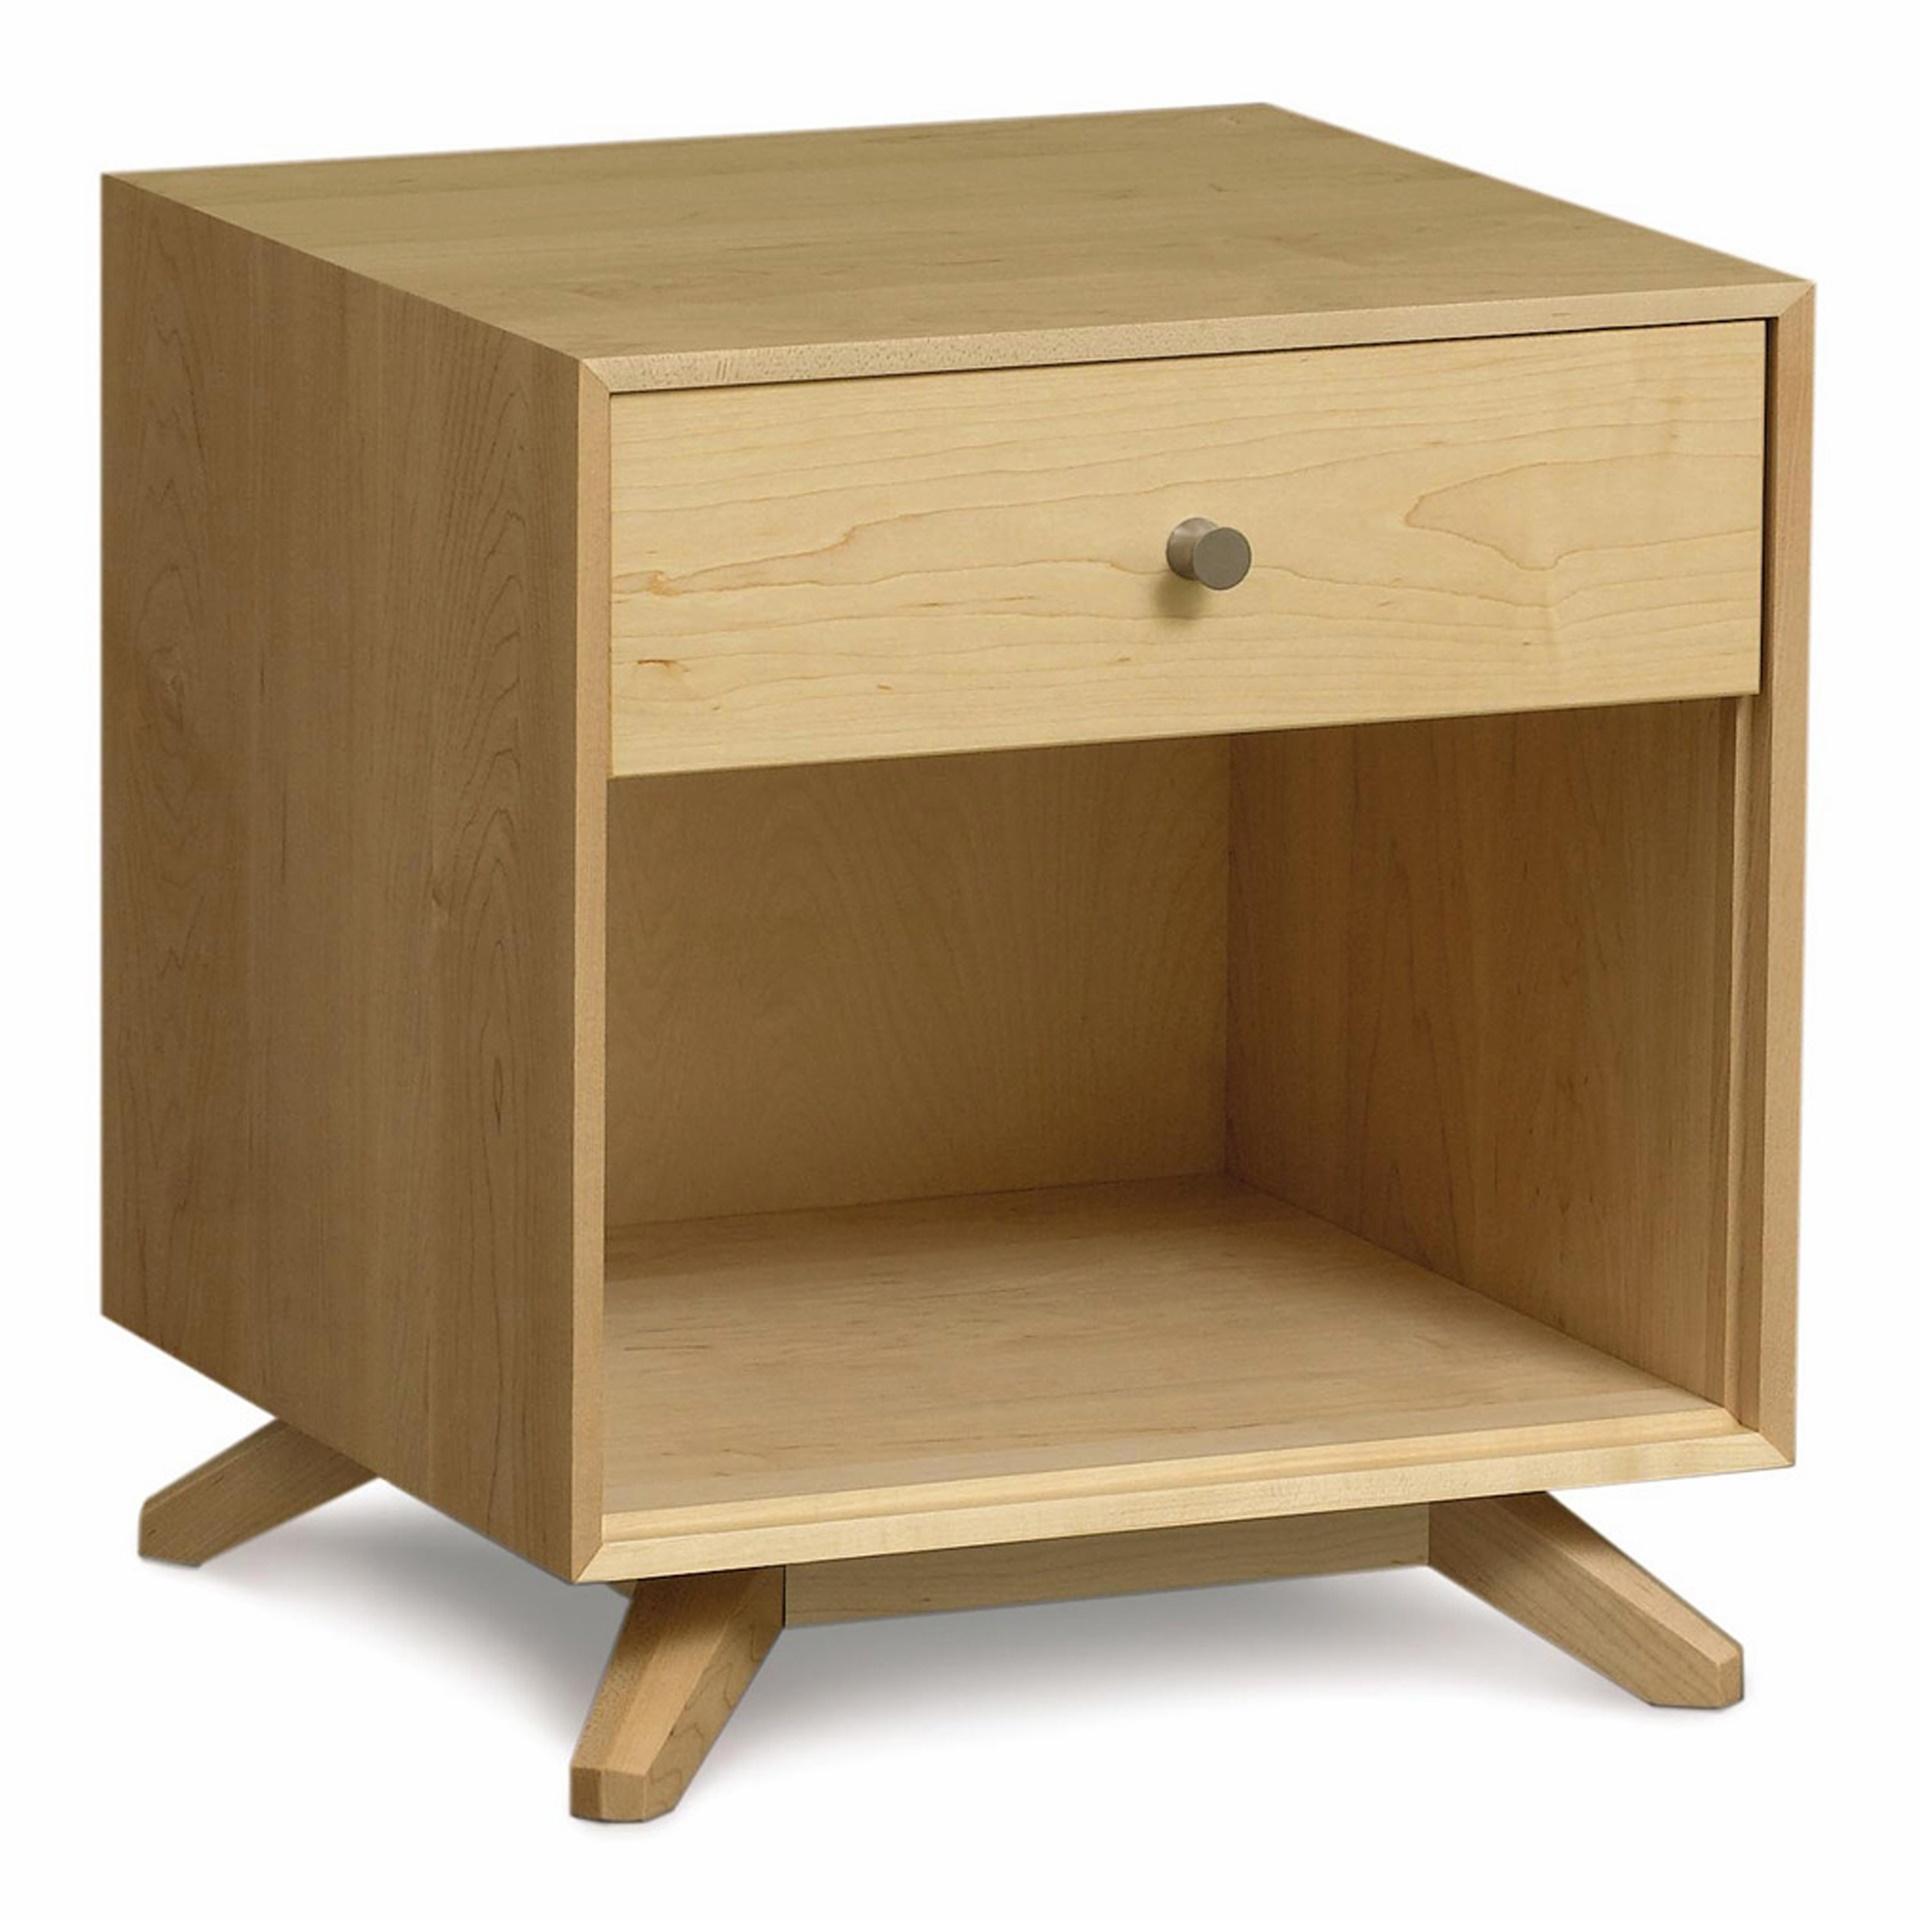 Copeland Furniture Astrid 1 Drawer Nightstand